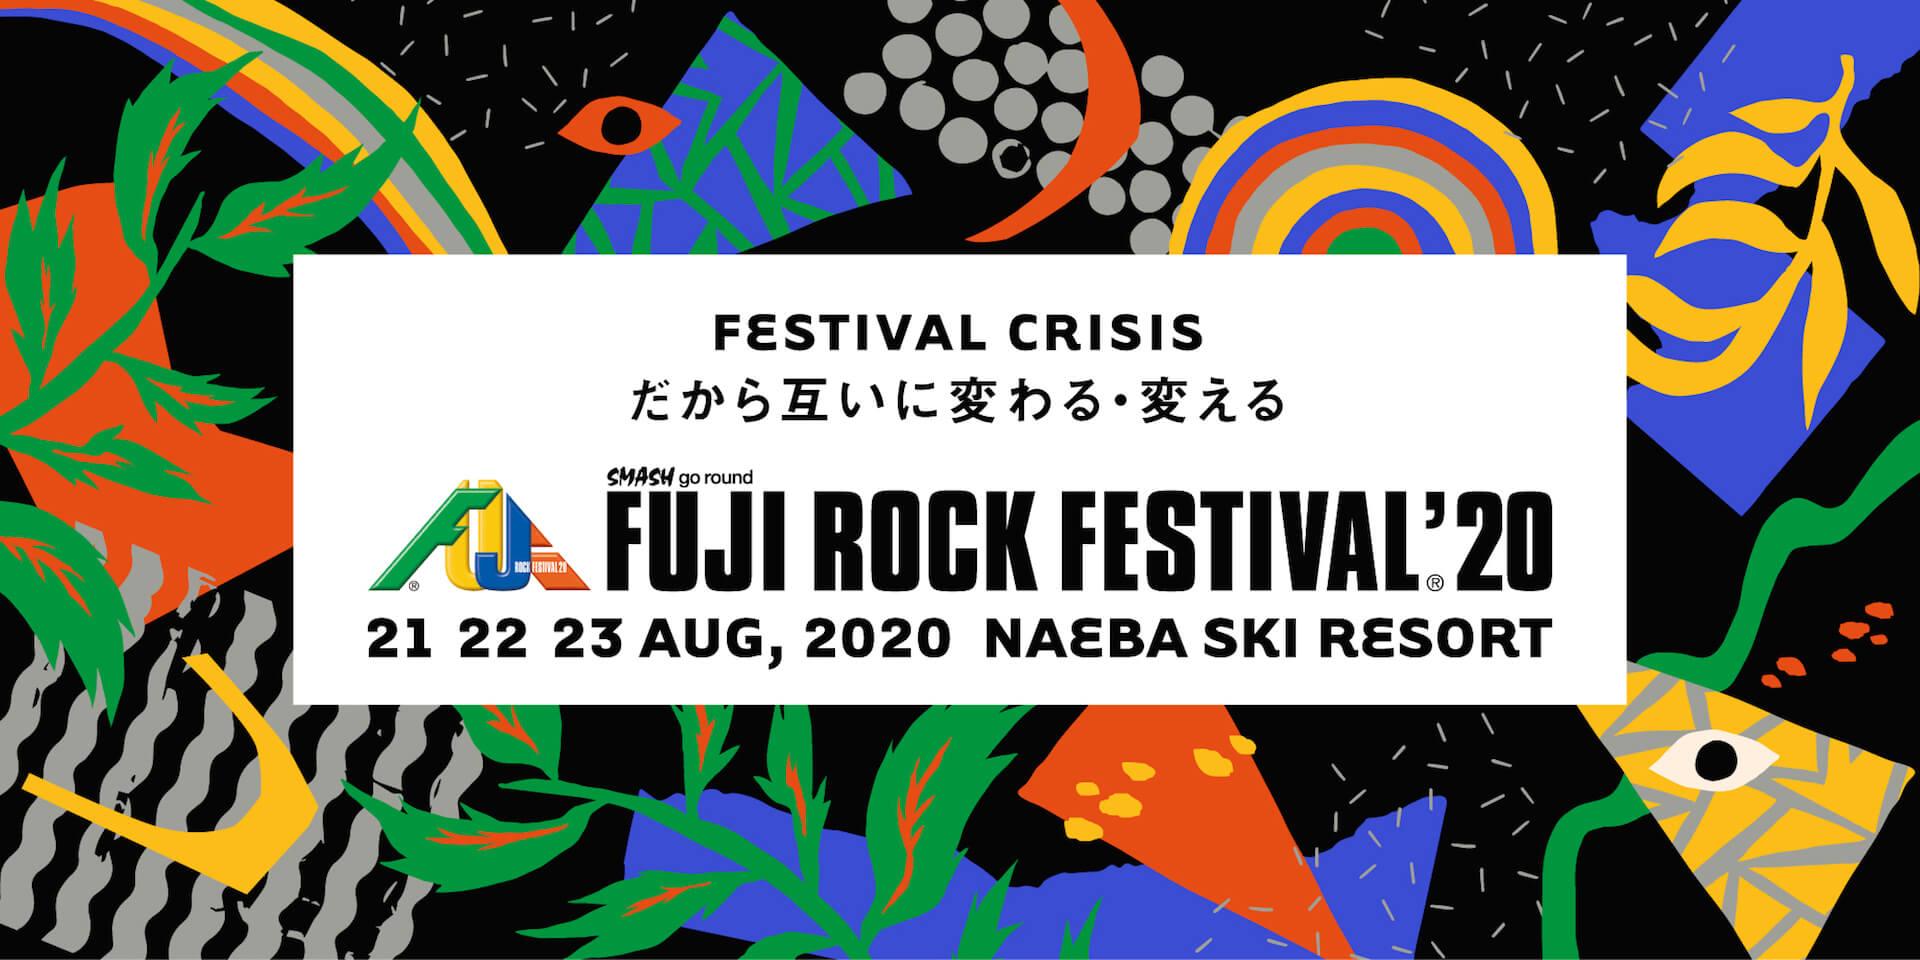 <FUJI ROCK FESTIVAL '20>の早割チケット受付開始日が2月10日に決定!ボードウォーク一部架け直しのためのクラウドファンディングも実施 music200131_frf2020_2